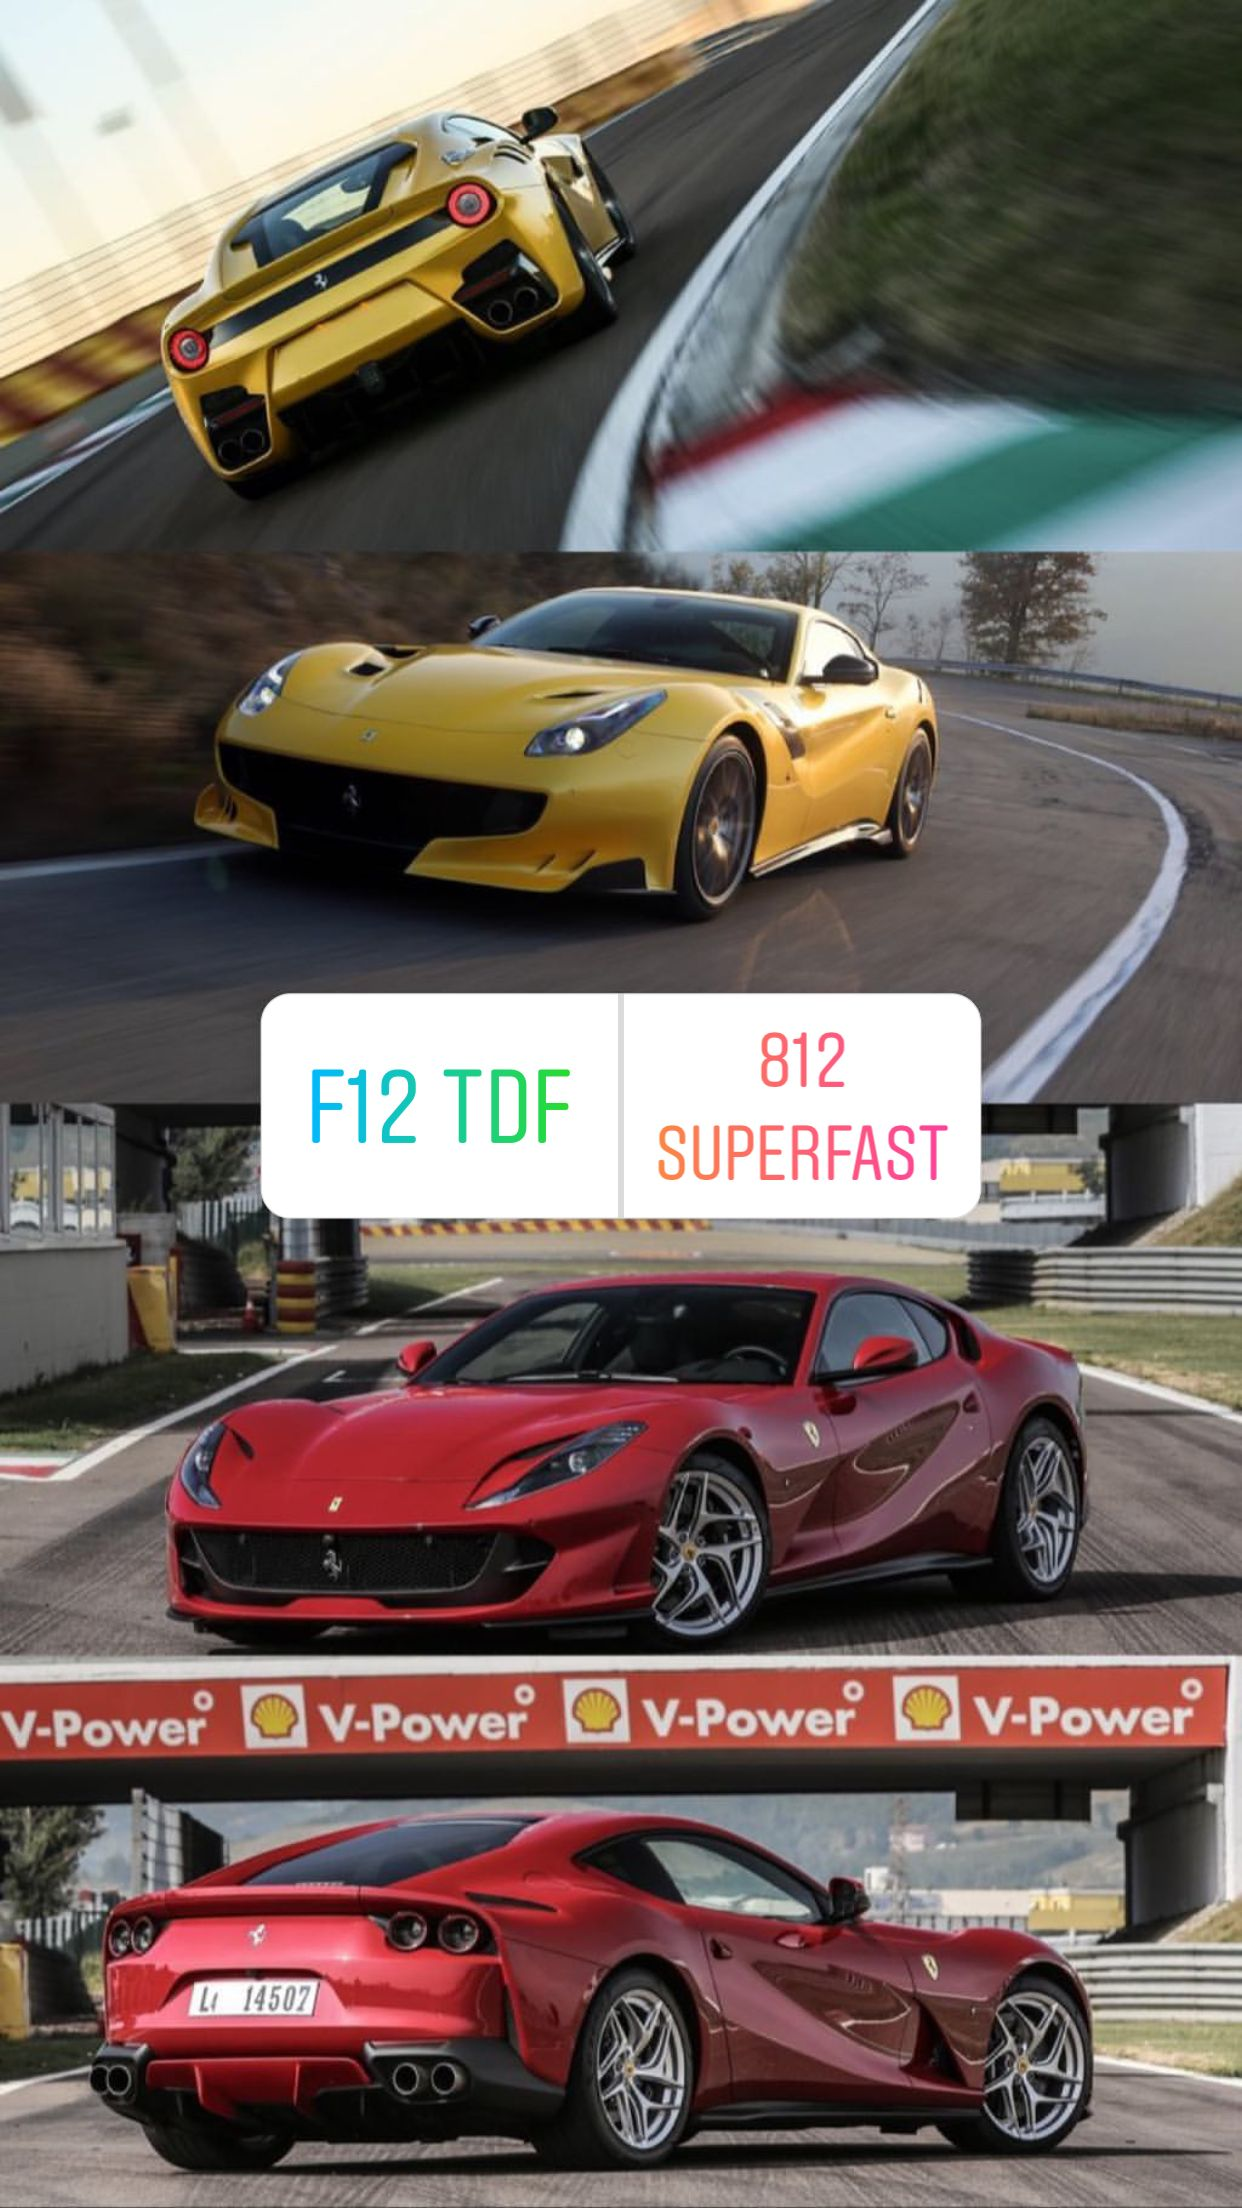 F12 Tdf Or 812 Superfast Ferrari Super Cars Sports Car